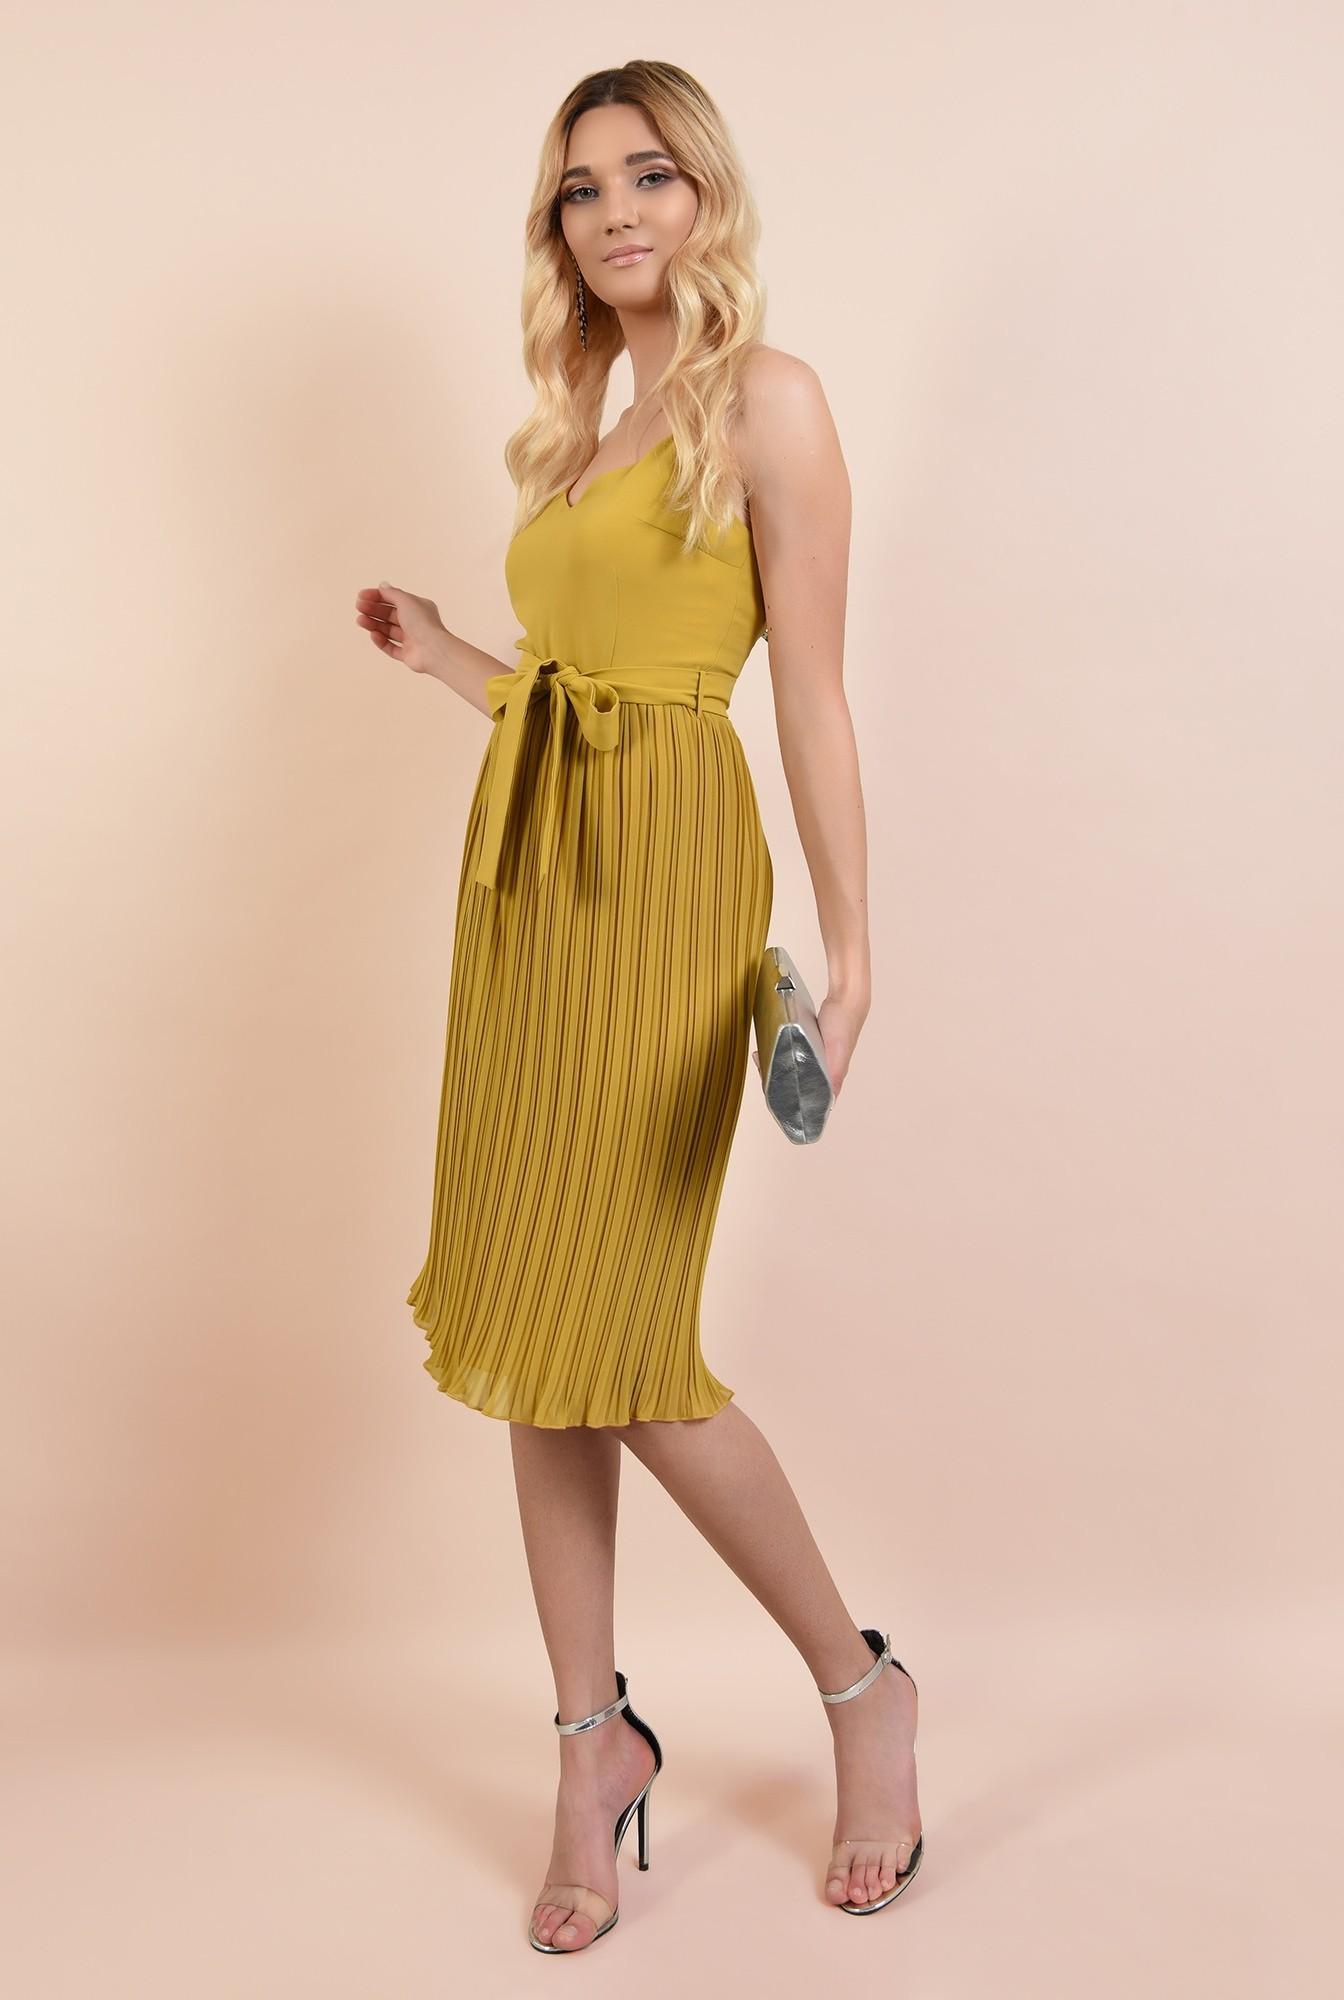 360 - rochie eleganta, mustar, cu bretele spaghetti, cordon in talie, fusta plisata